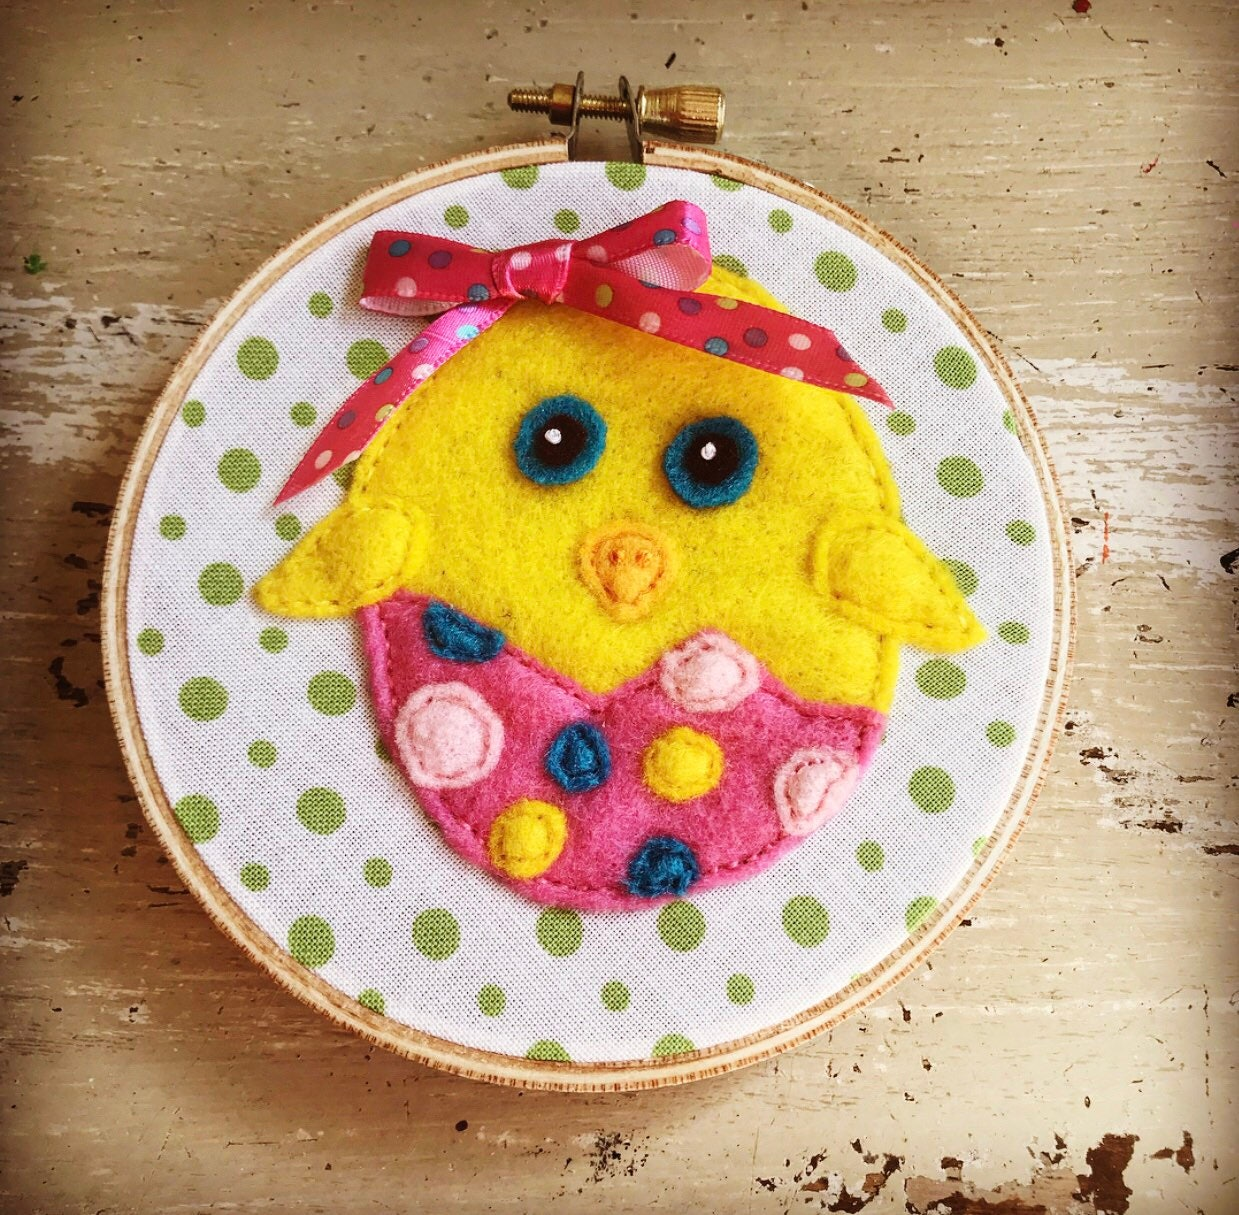 Cute Felt Easter Egg Chick, Wall Hanging, Hoop Art, Polka Dots ...